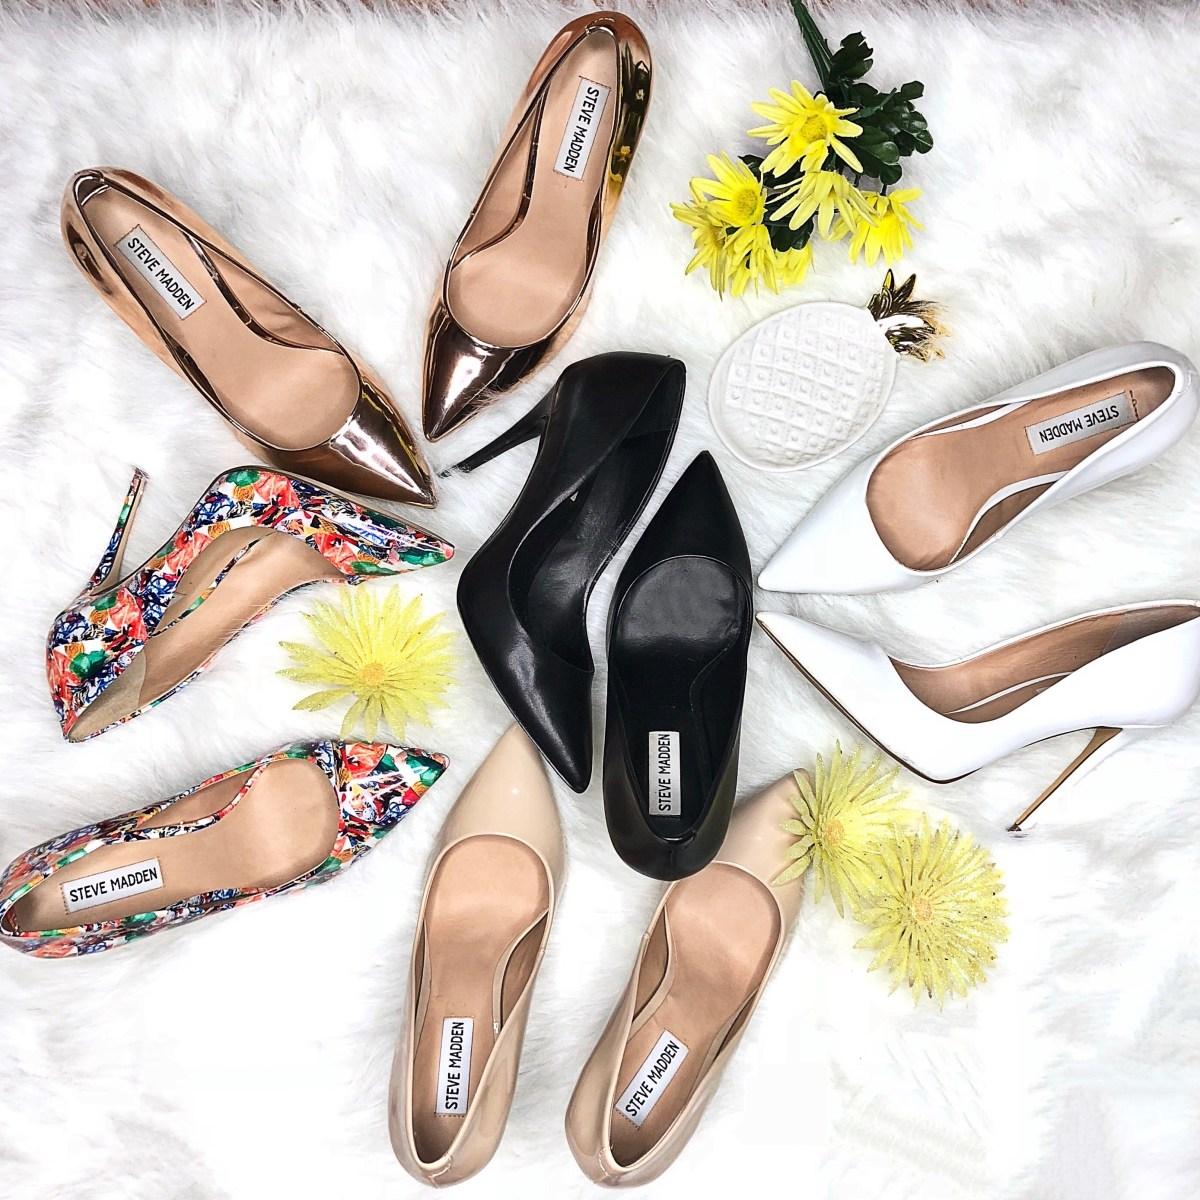 48e8b48f6c7 Steve Madden Daisies Fashion Themichellewest Blog